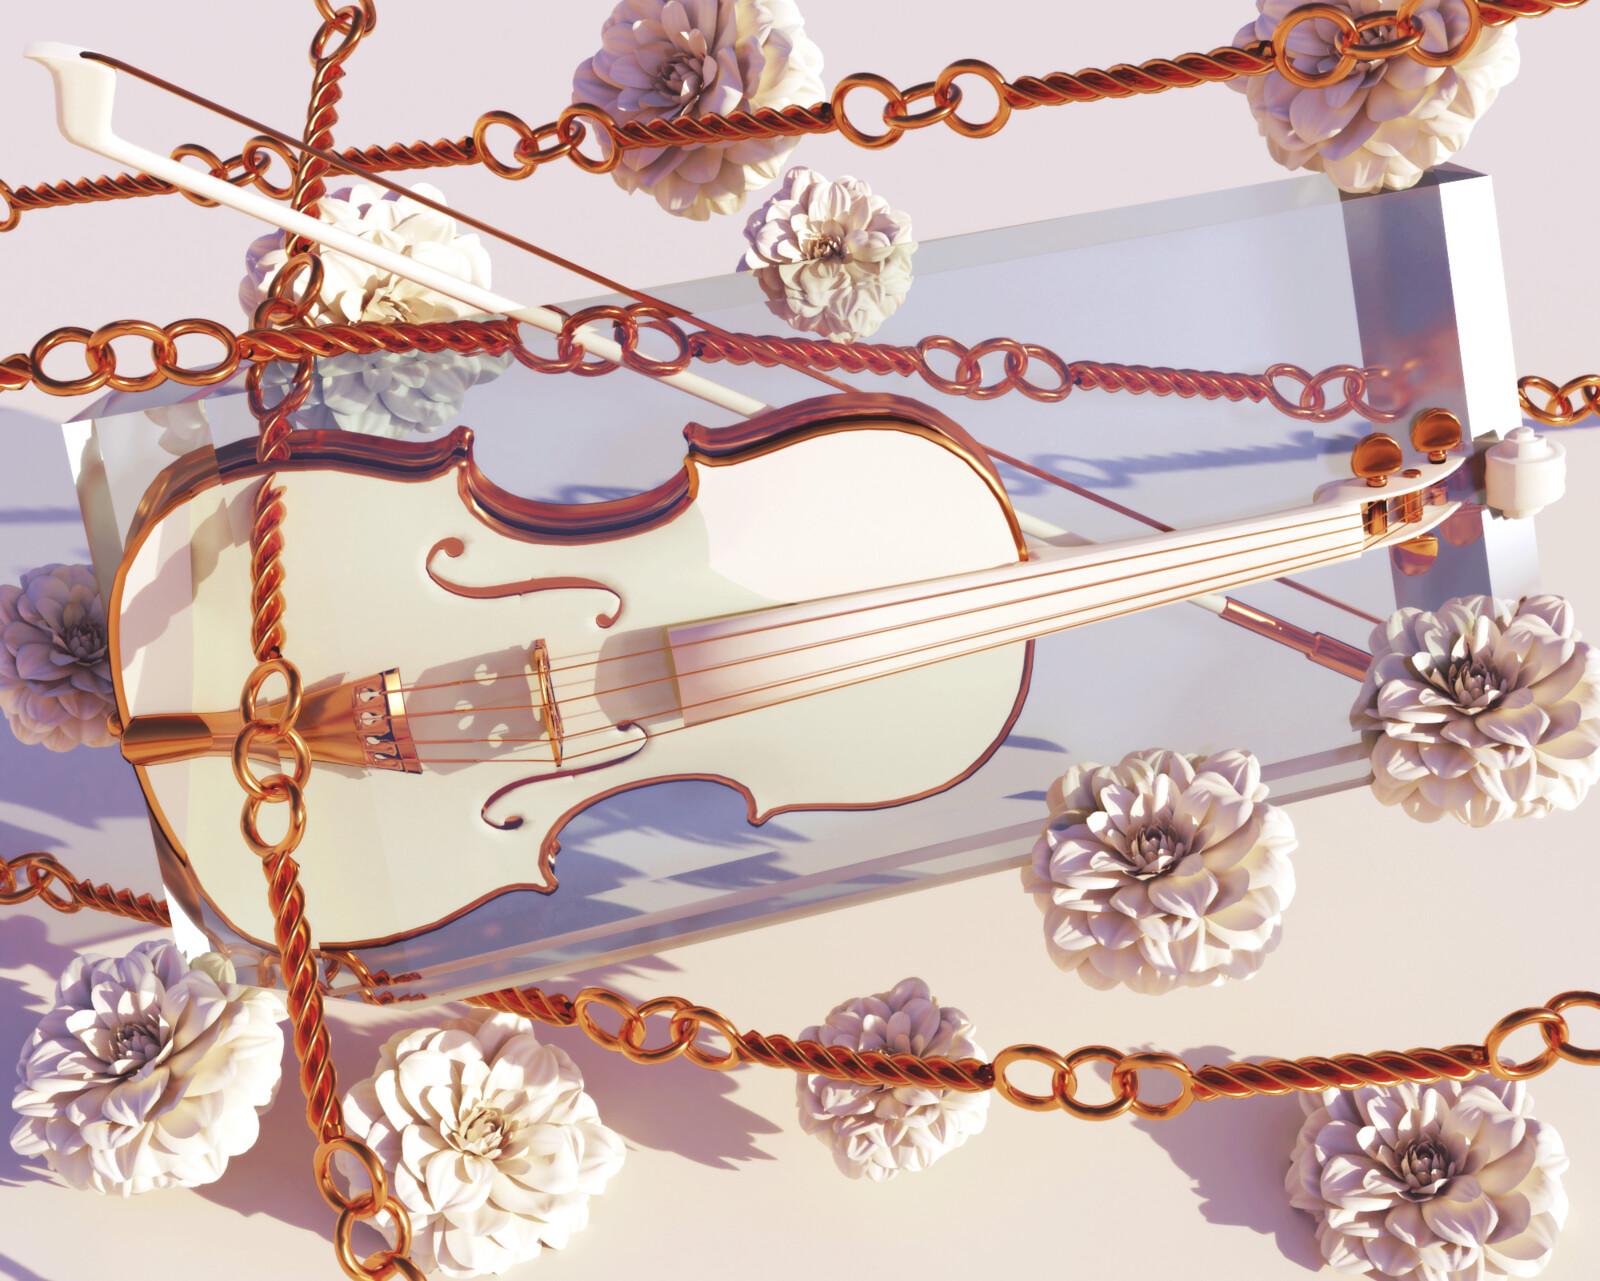 Violin on ice